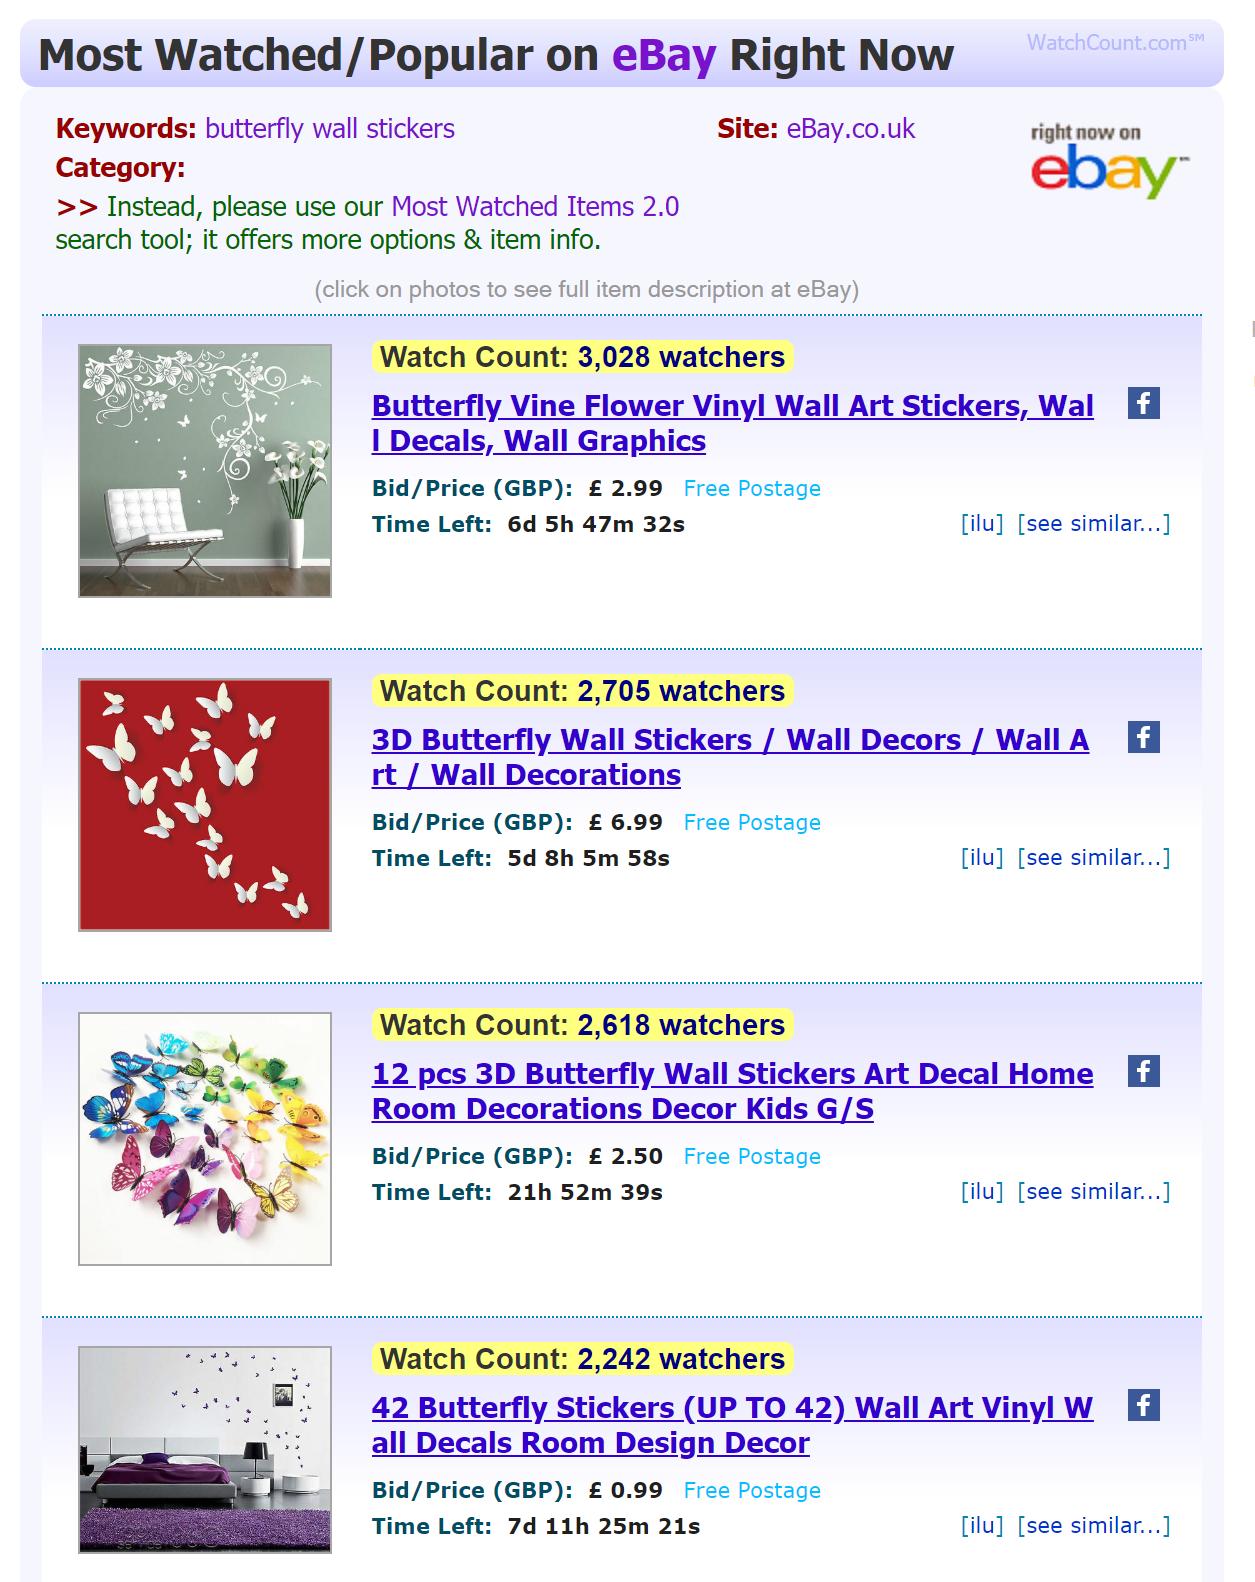 eBay Watch Count